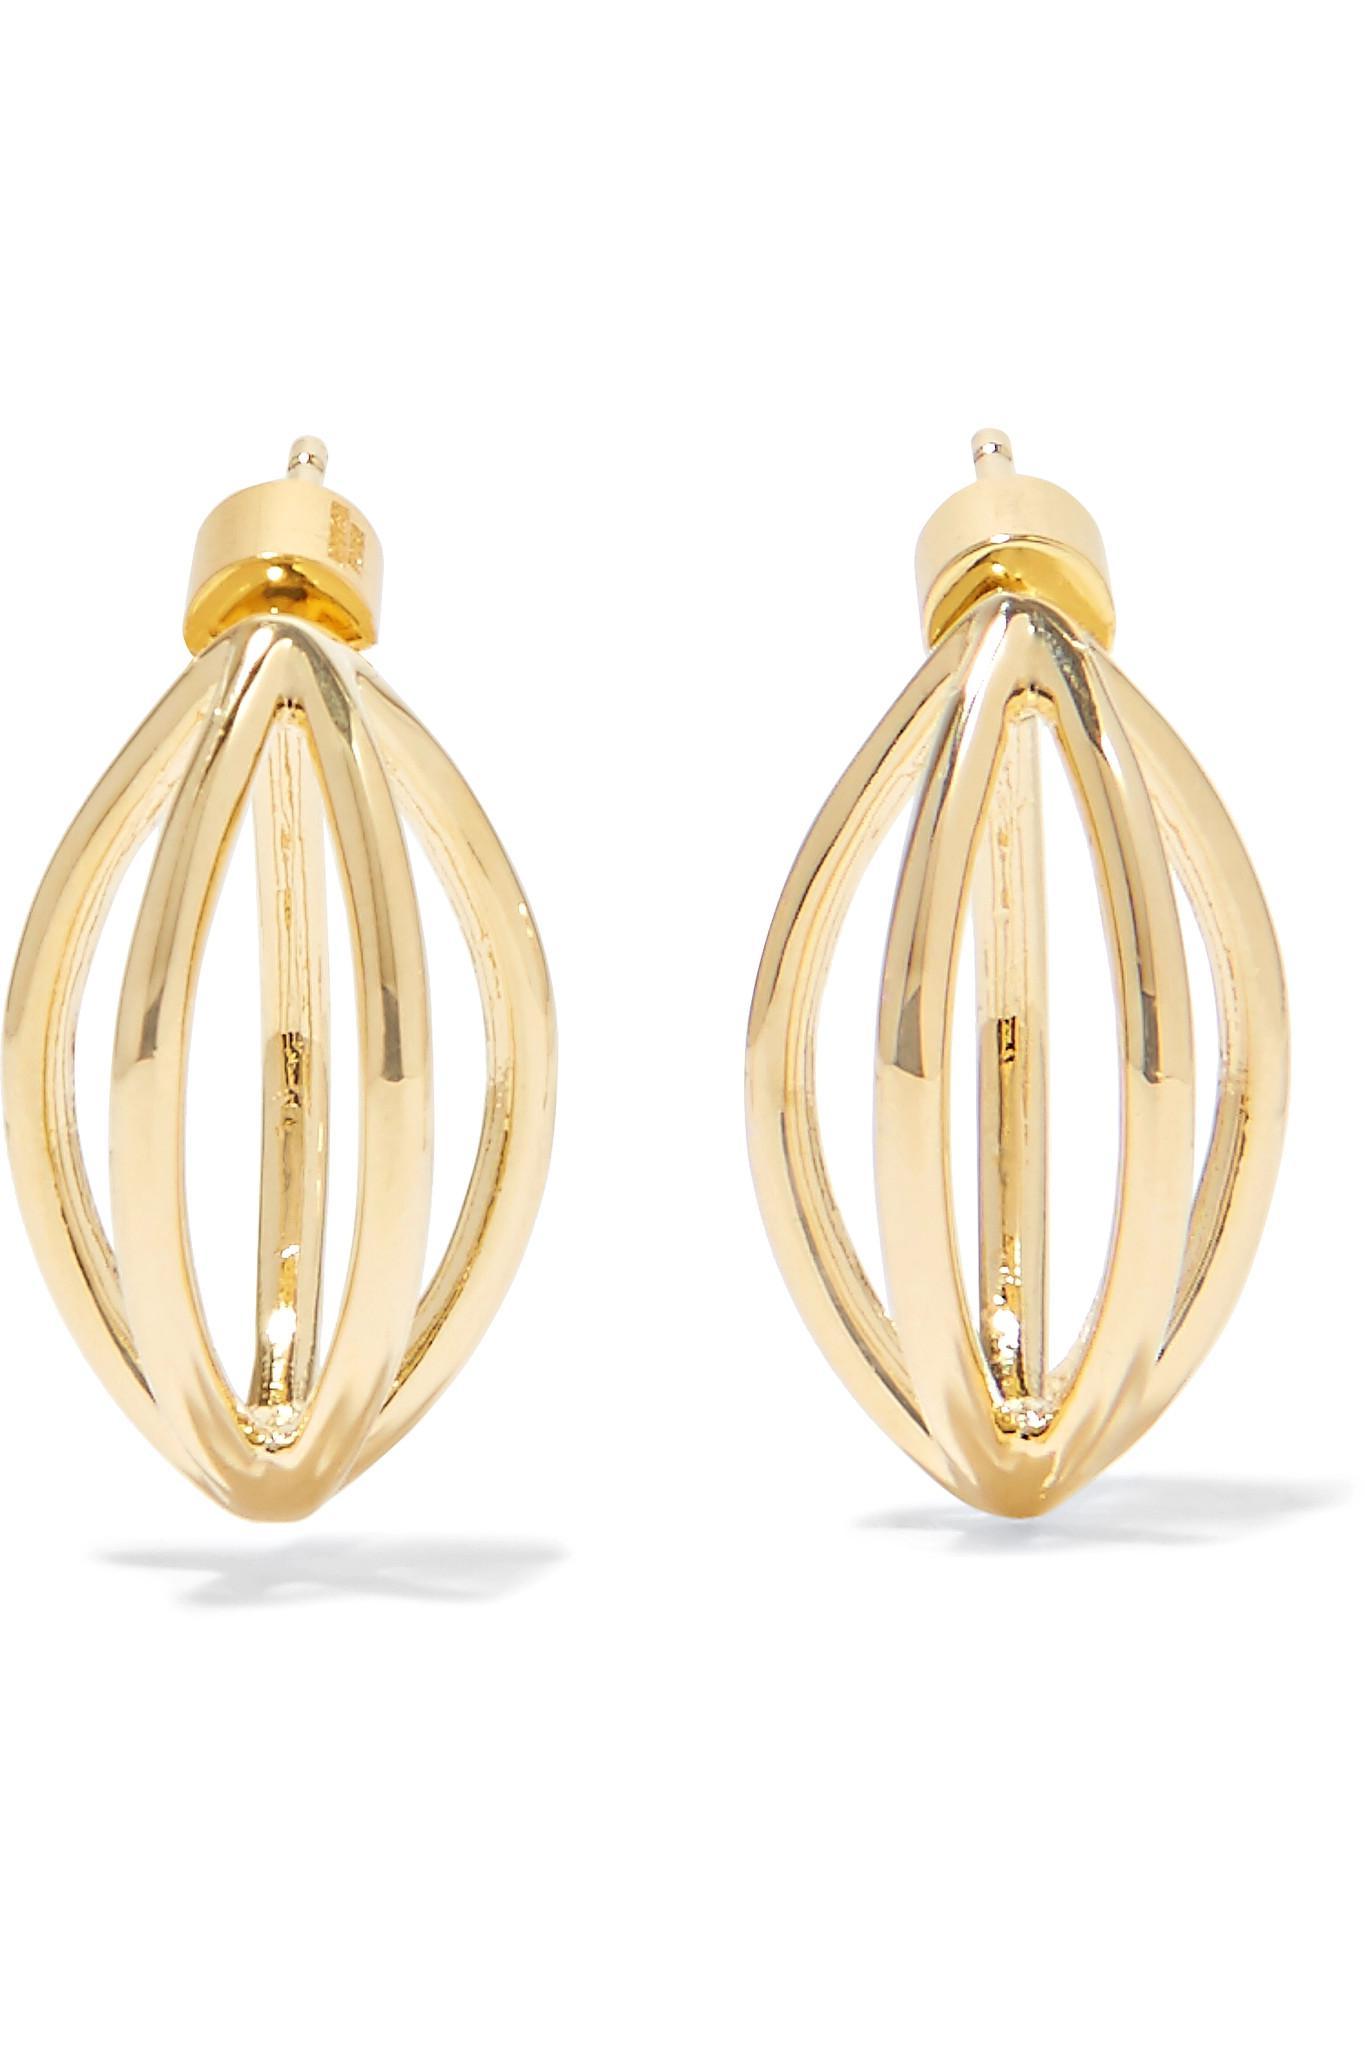 Jennifer Fisher Unicorn Gold-plated Earrings sL9VGOzD2